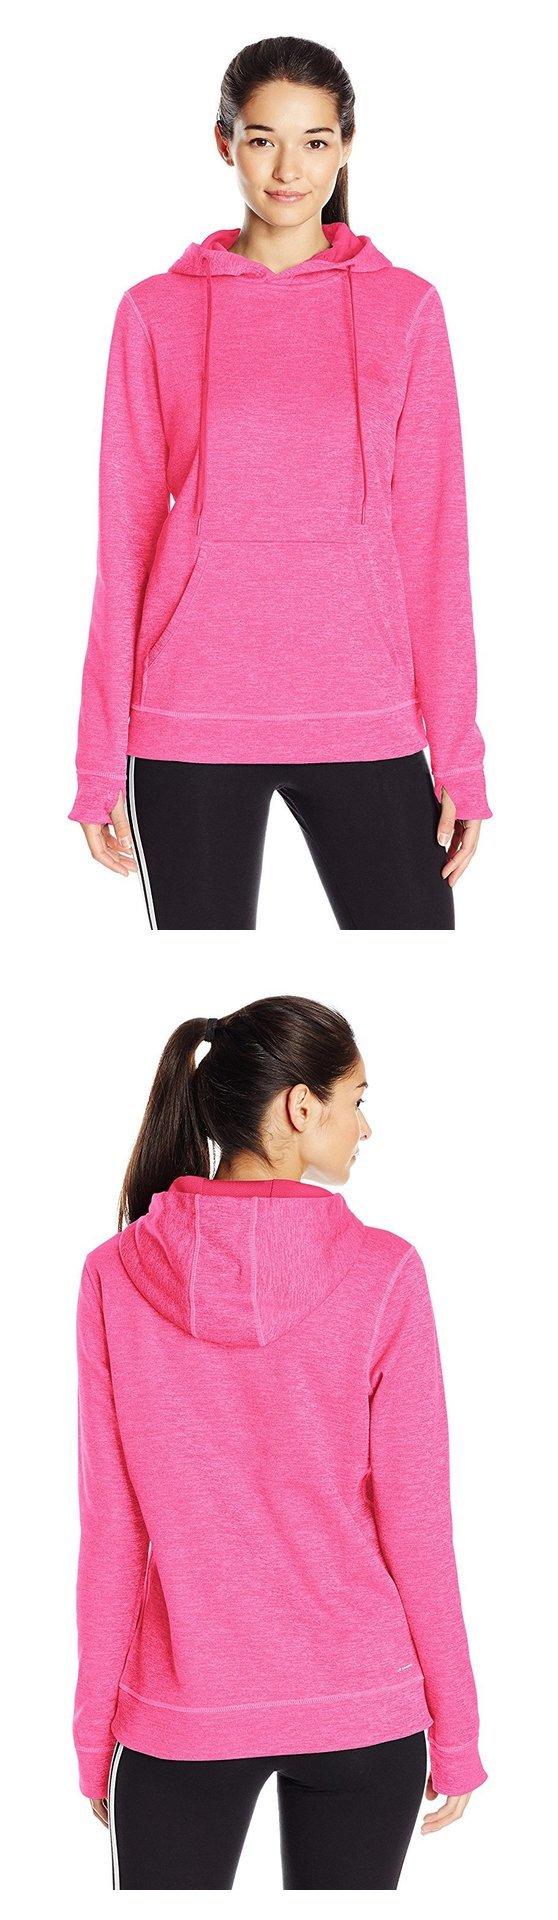 $20.03 - adidas Women's Team Issue Fleece Pullover Hoodie Shock Pink/Collegiate Heather #adidas